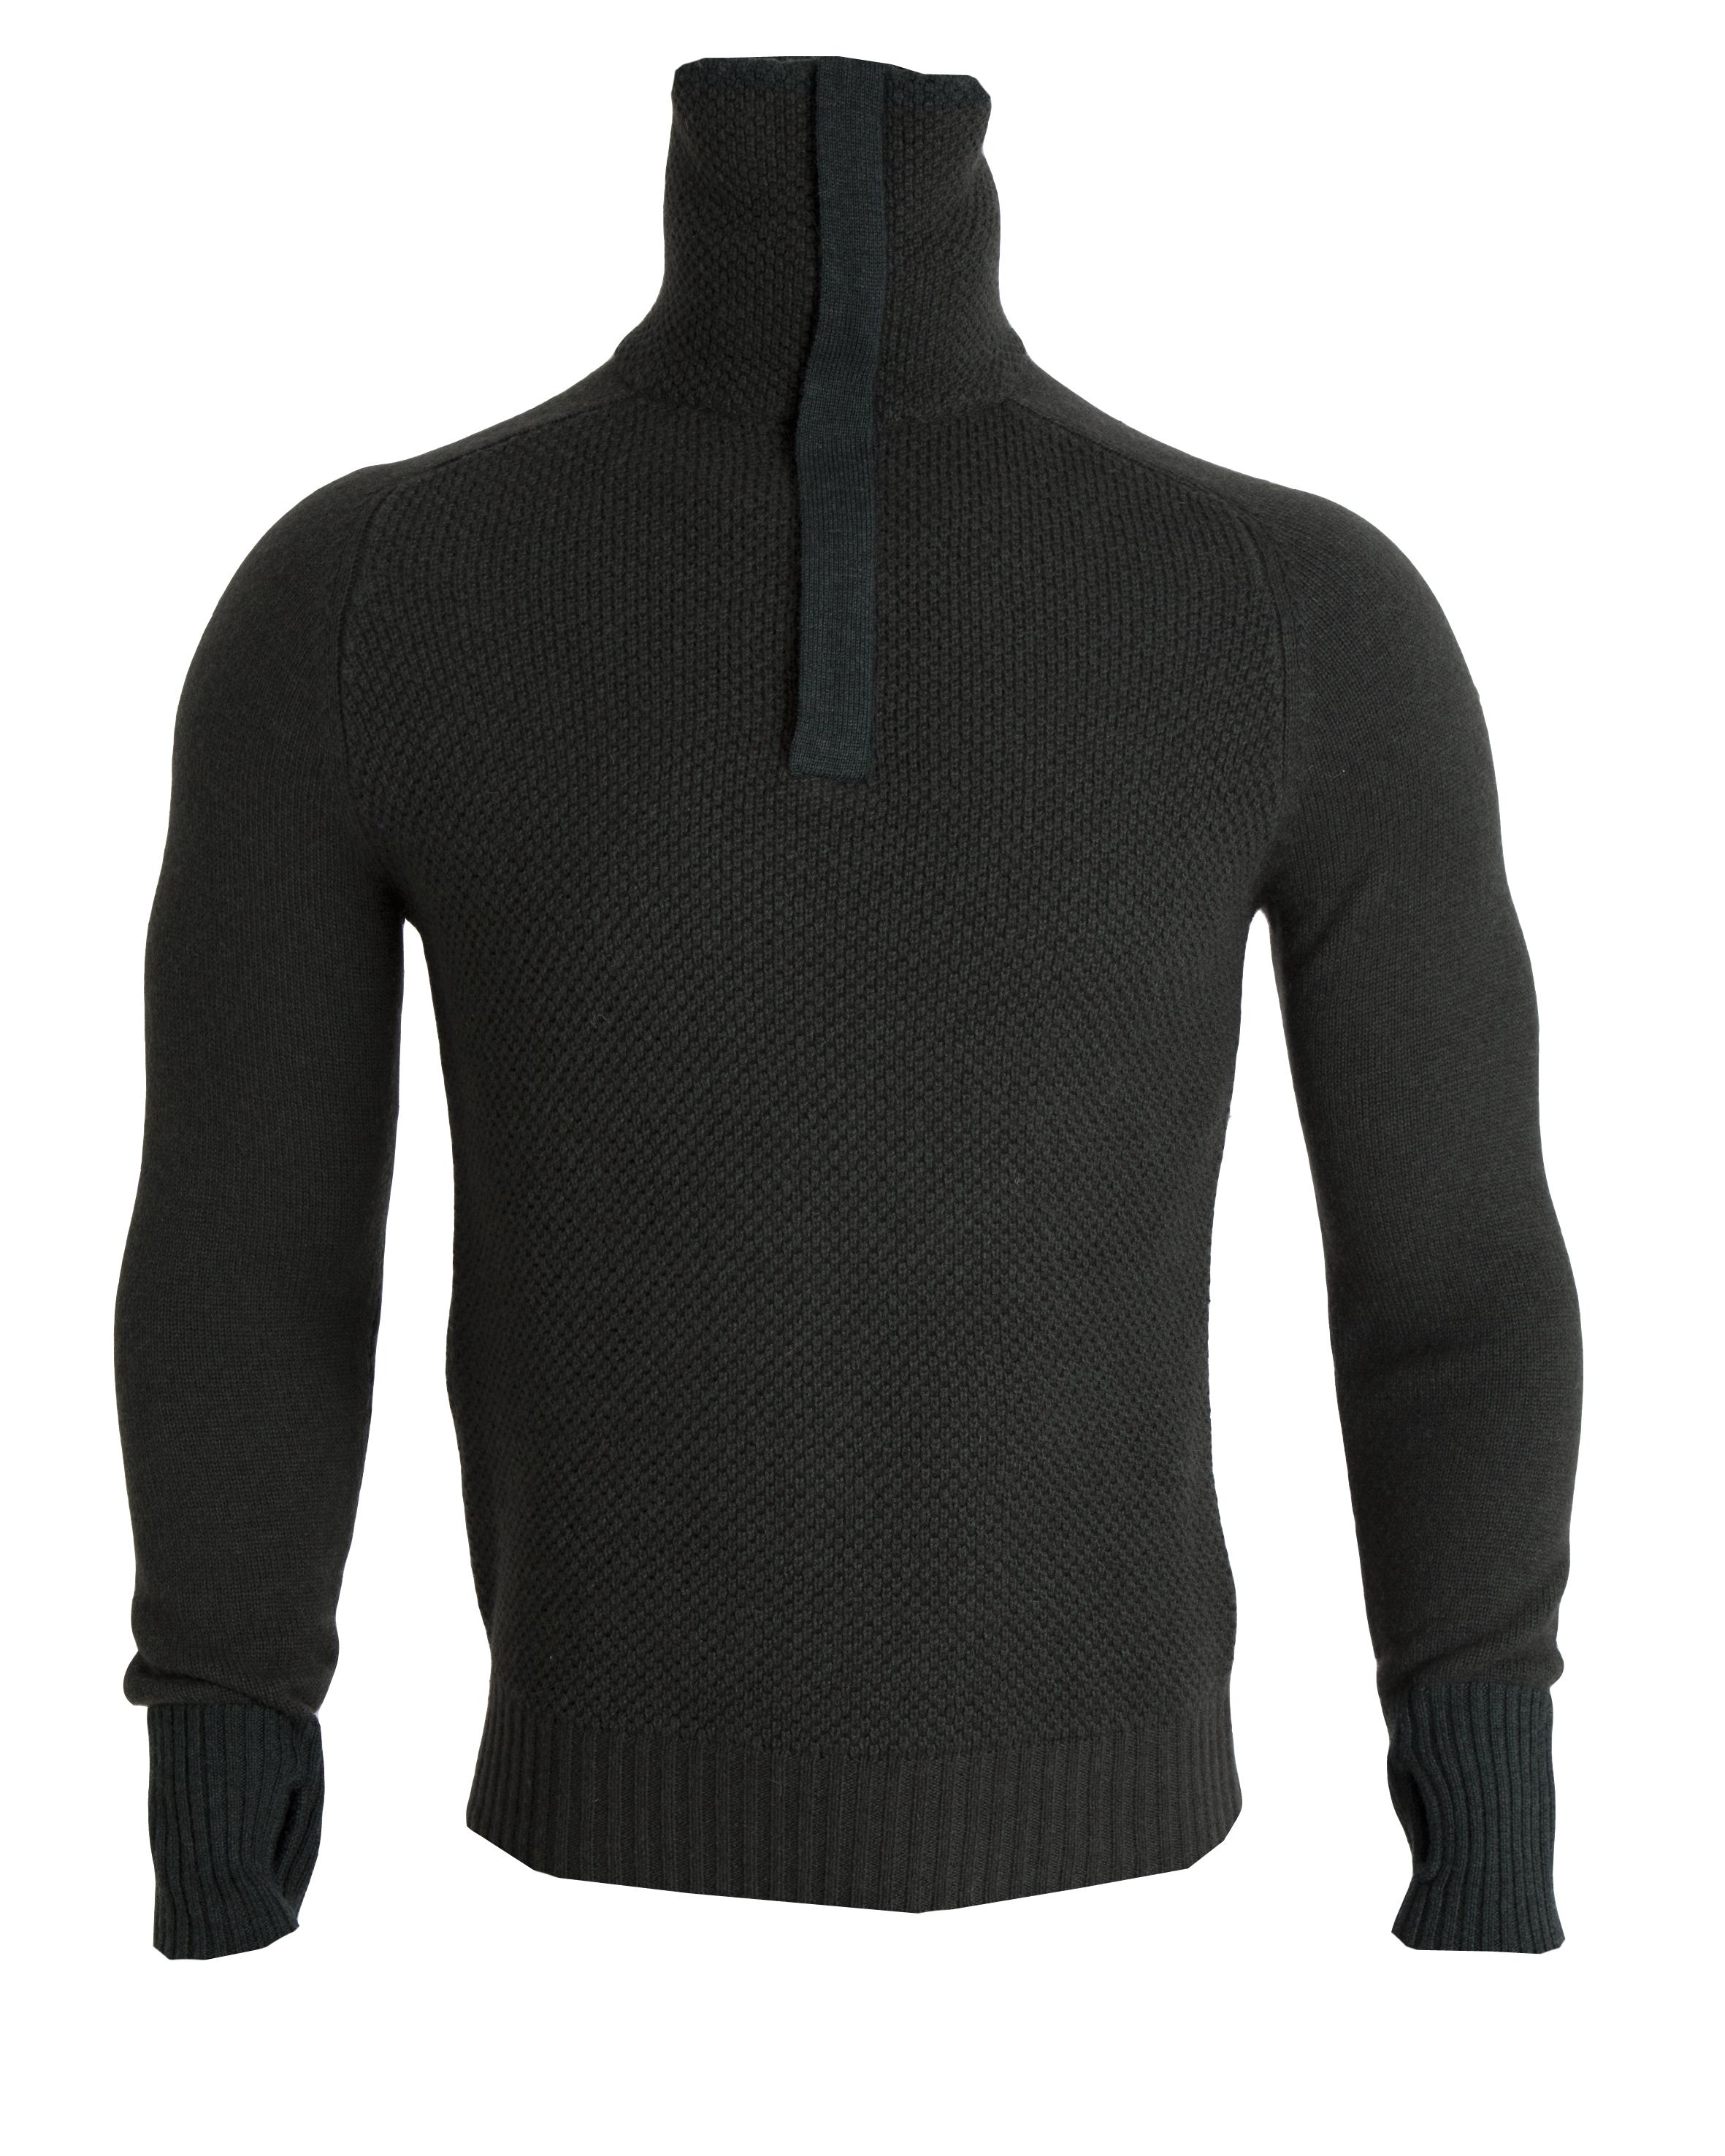 AW18 Tufte Unisex Bambull Blend Half Zip Sweater Deep Forest Melange Front.png